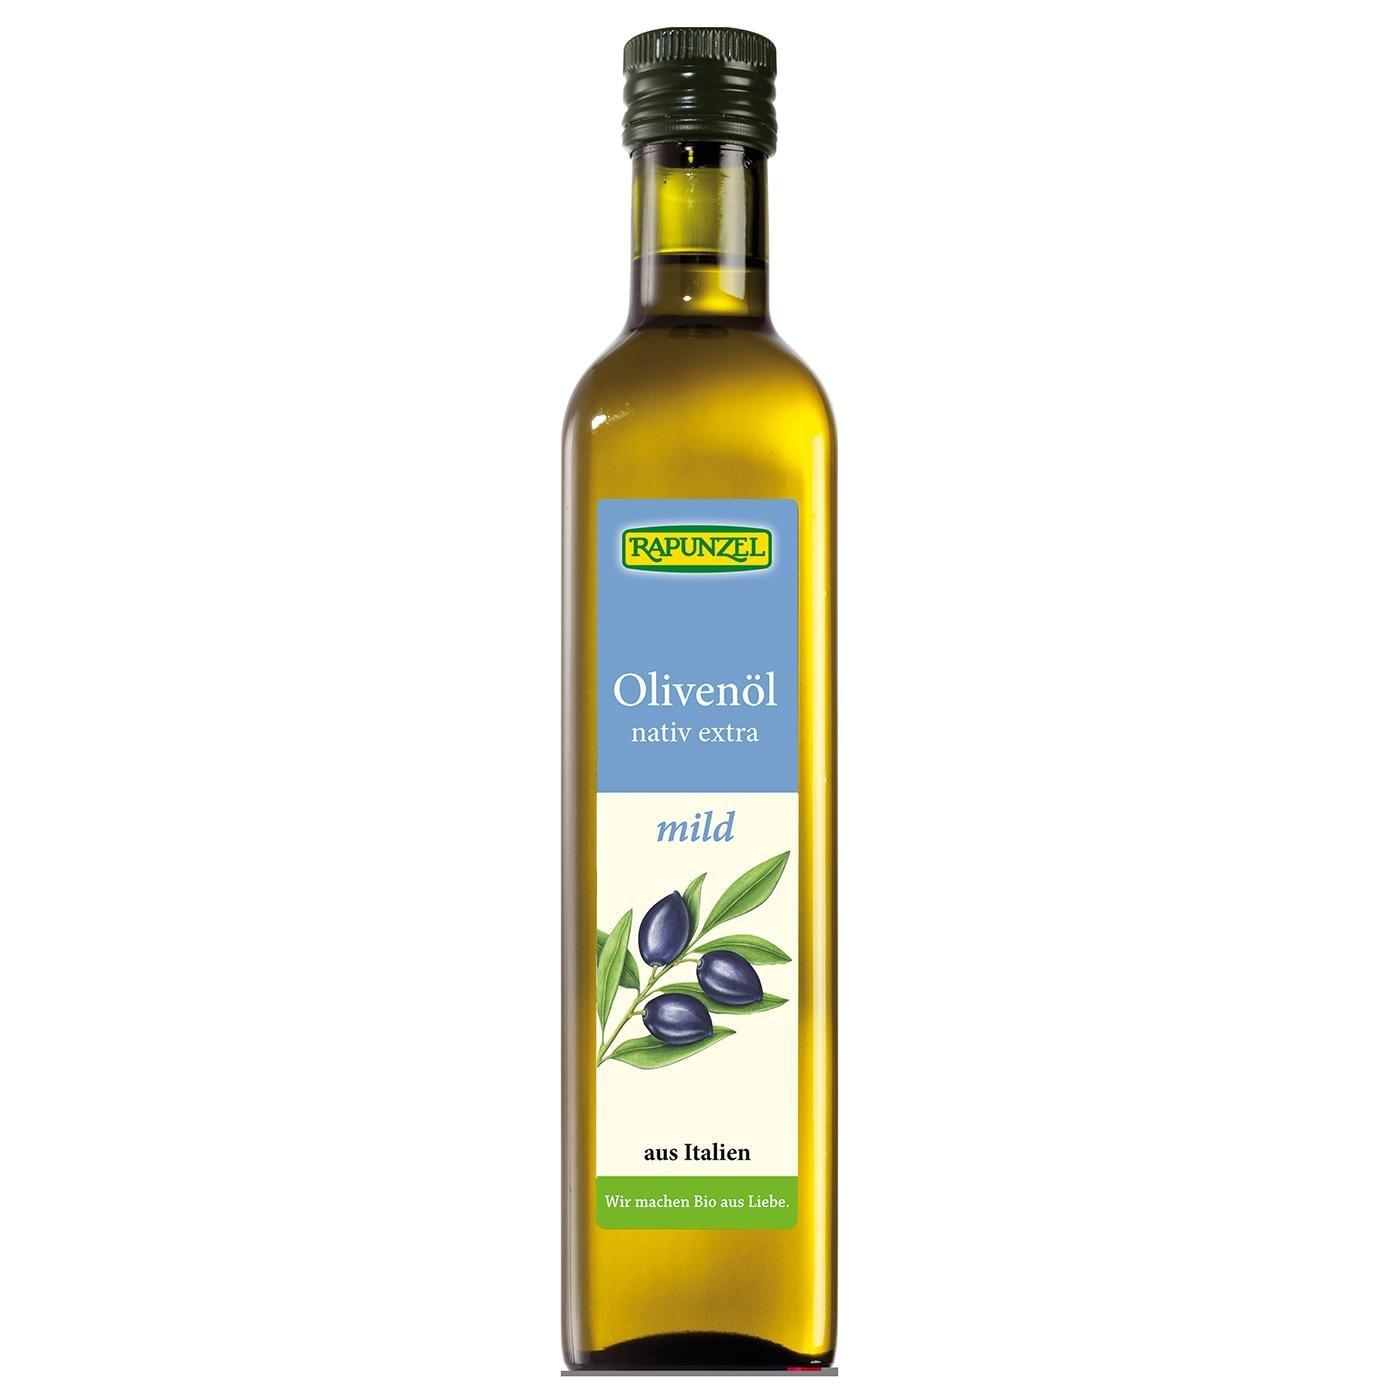 Rapunzel Bio Olivenöl mild nativ extra 0,5l